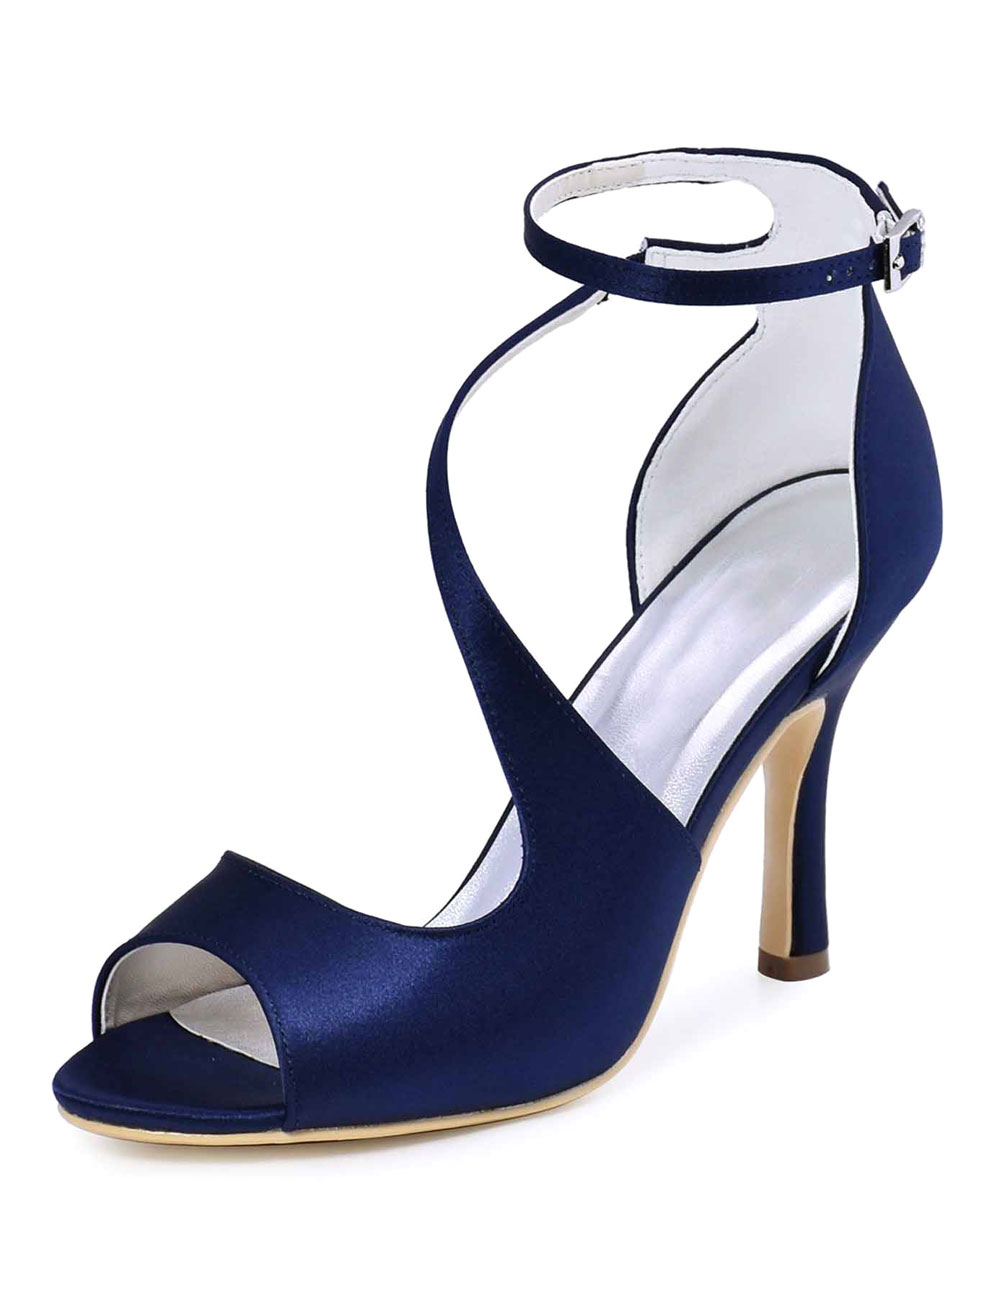 Women's Wedding Shoes Deep Blue Peep Toe Stiletto Ankle Strap Bridal Sandals